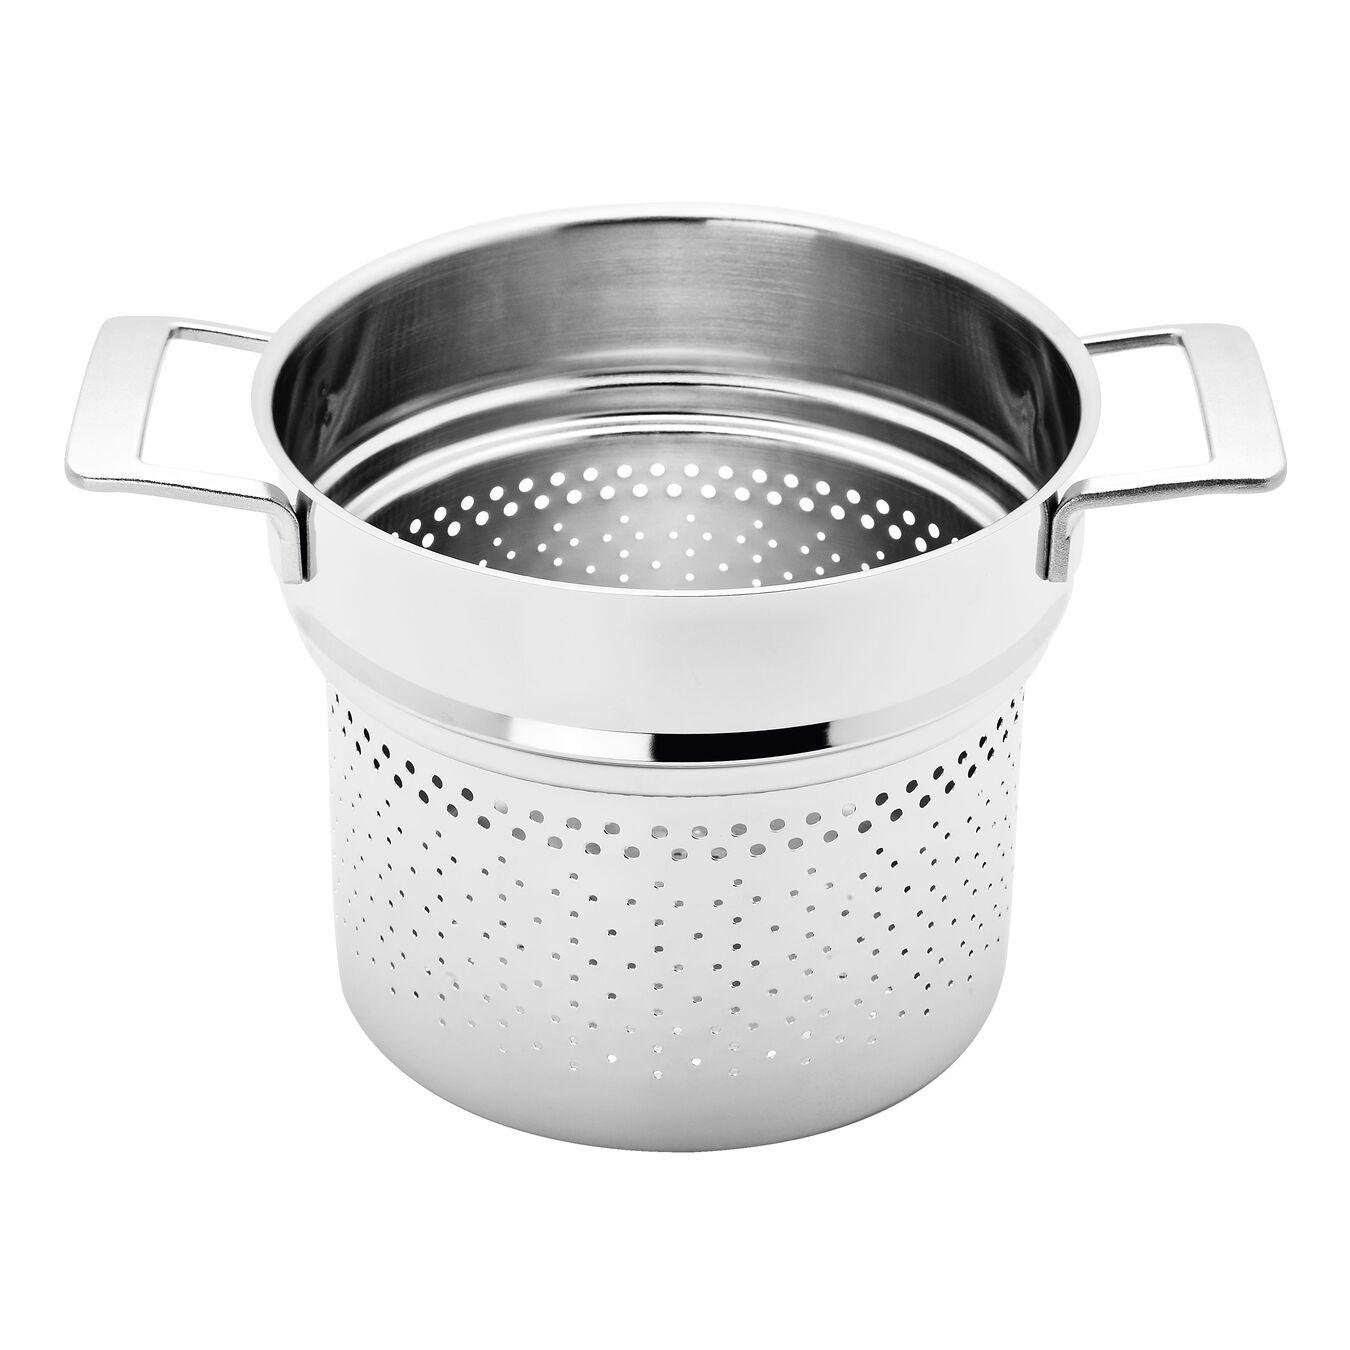 8-qt Stainless Steel Pasta Insert (Fits 8-qt Stock Pot),,large 1